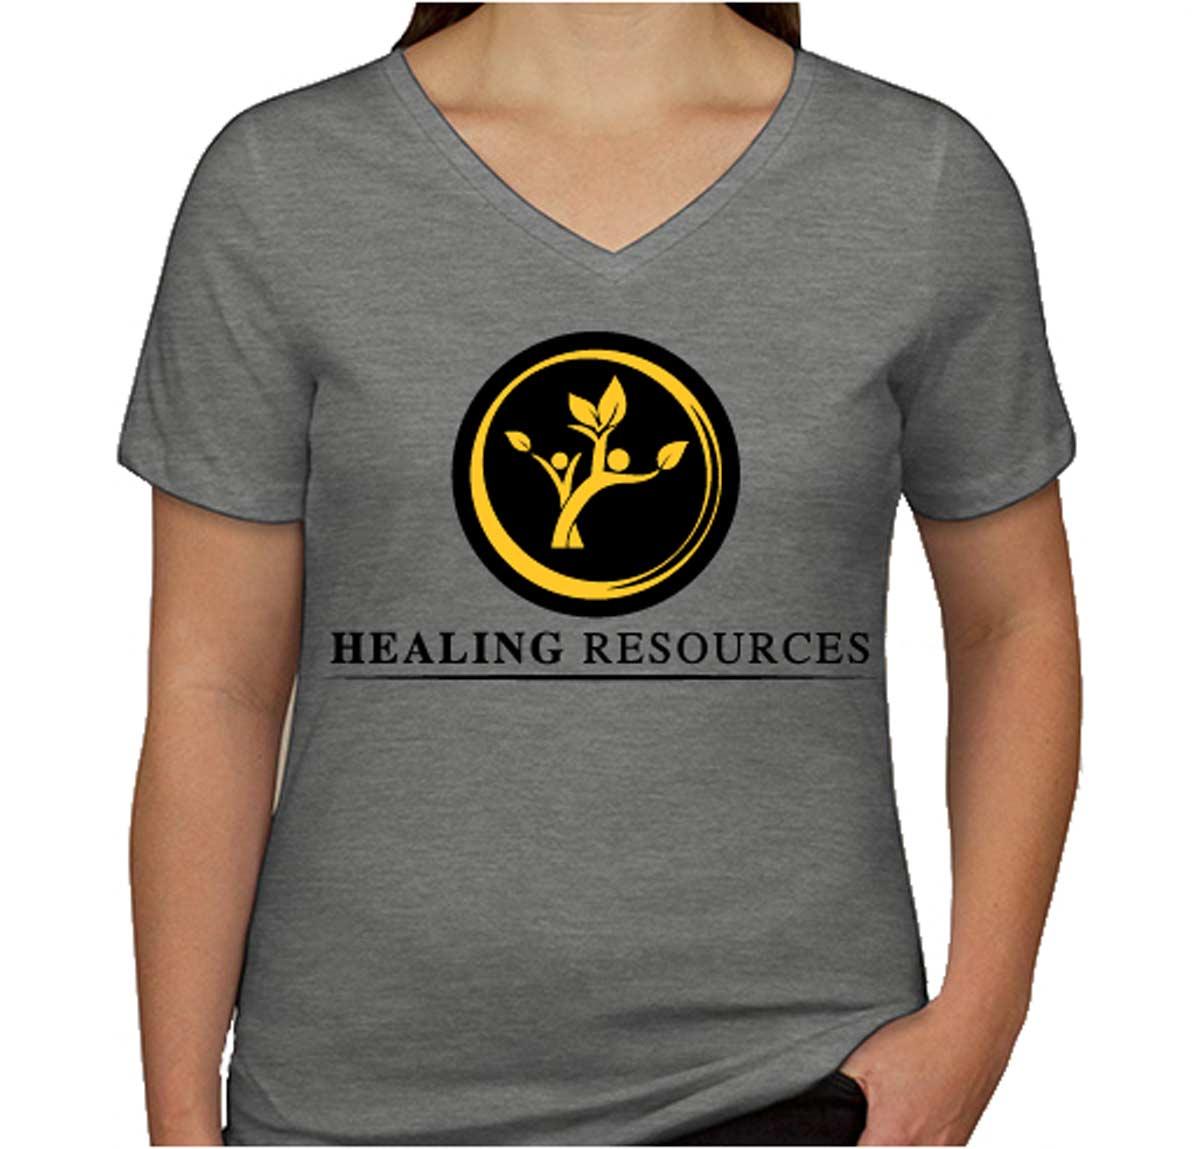 Healing Resources Women's V-Neck